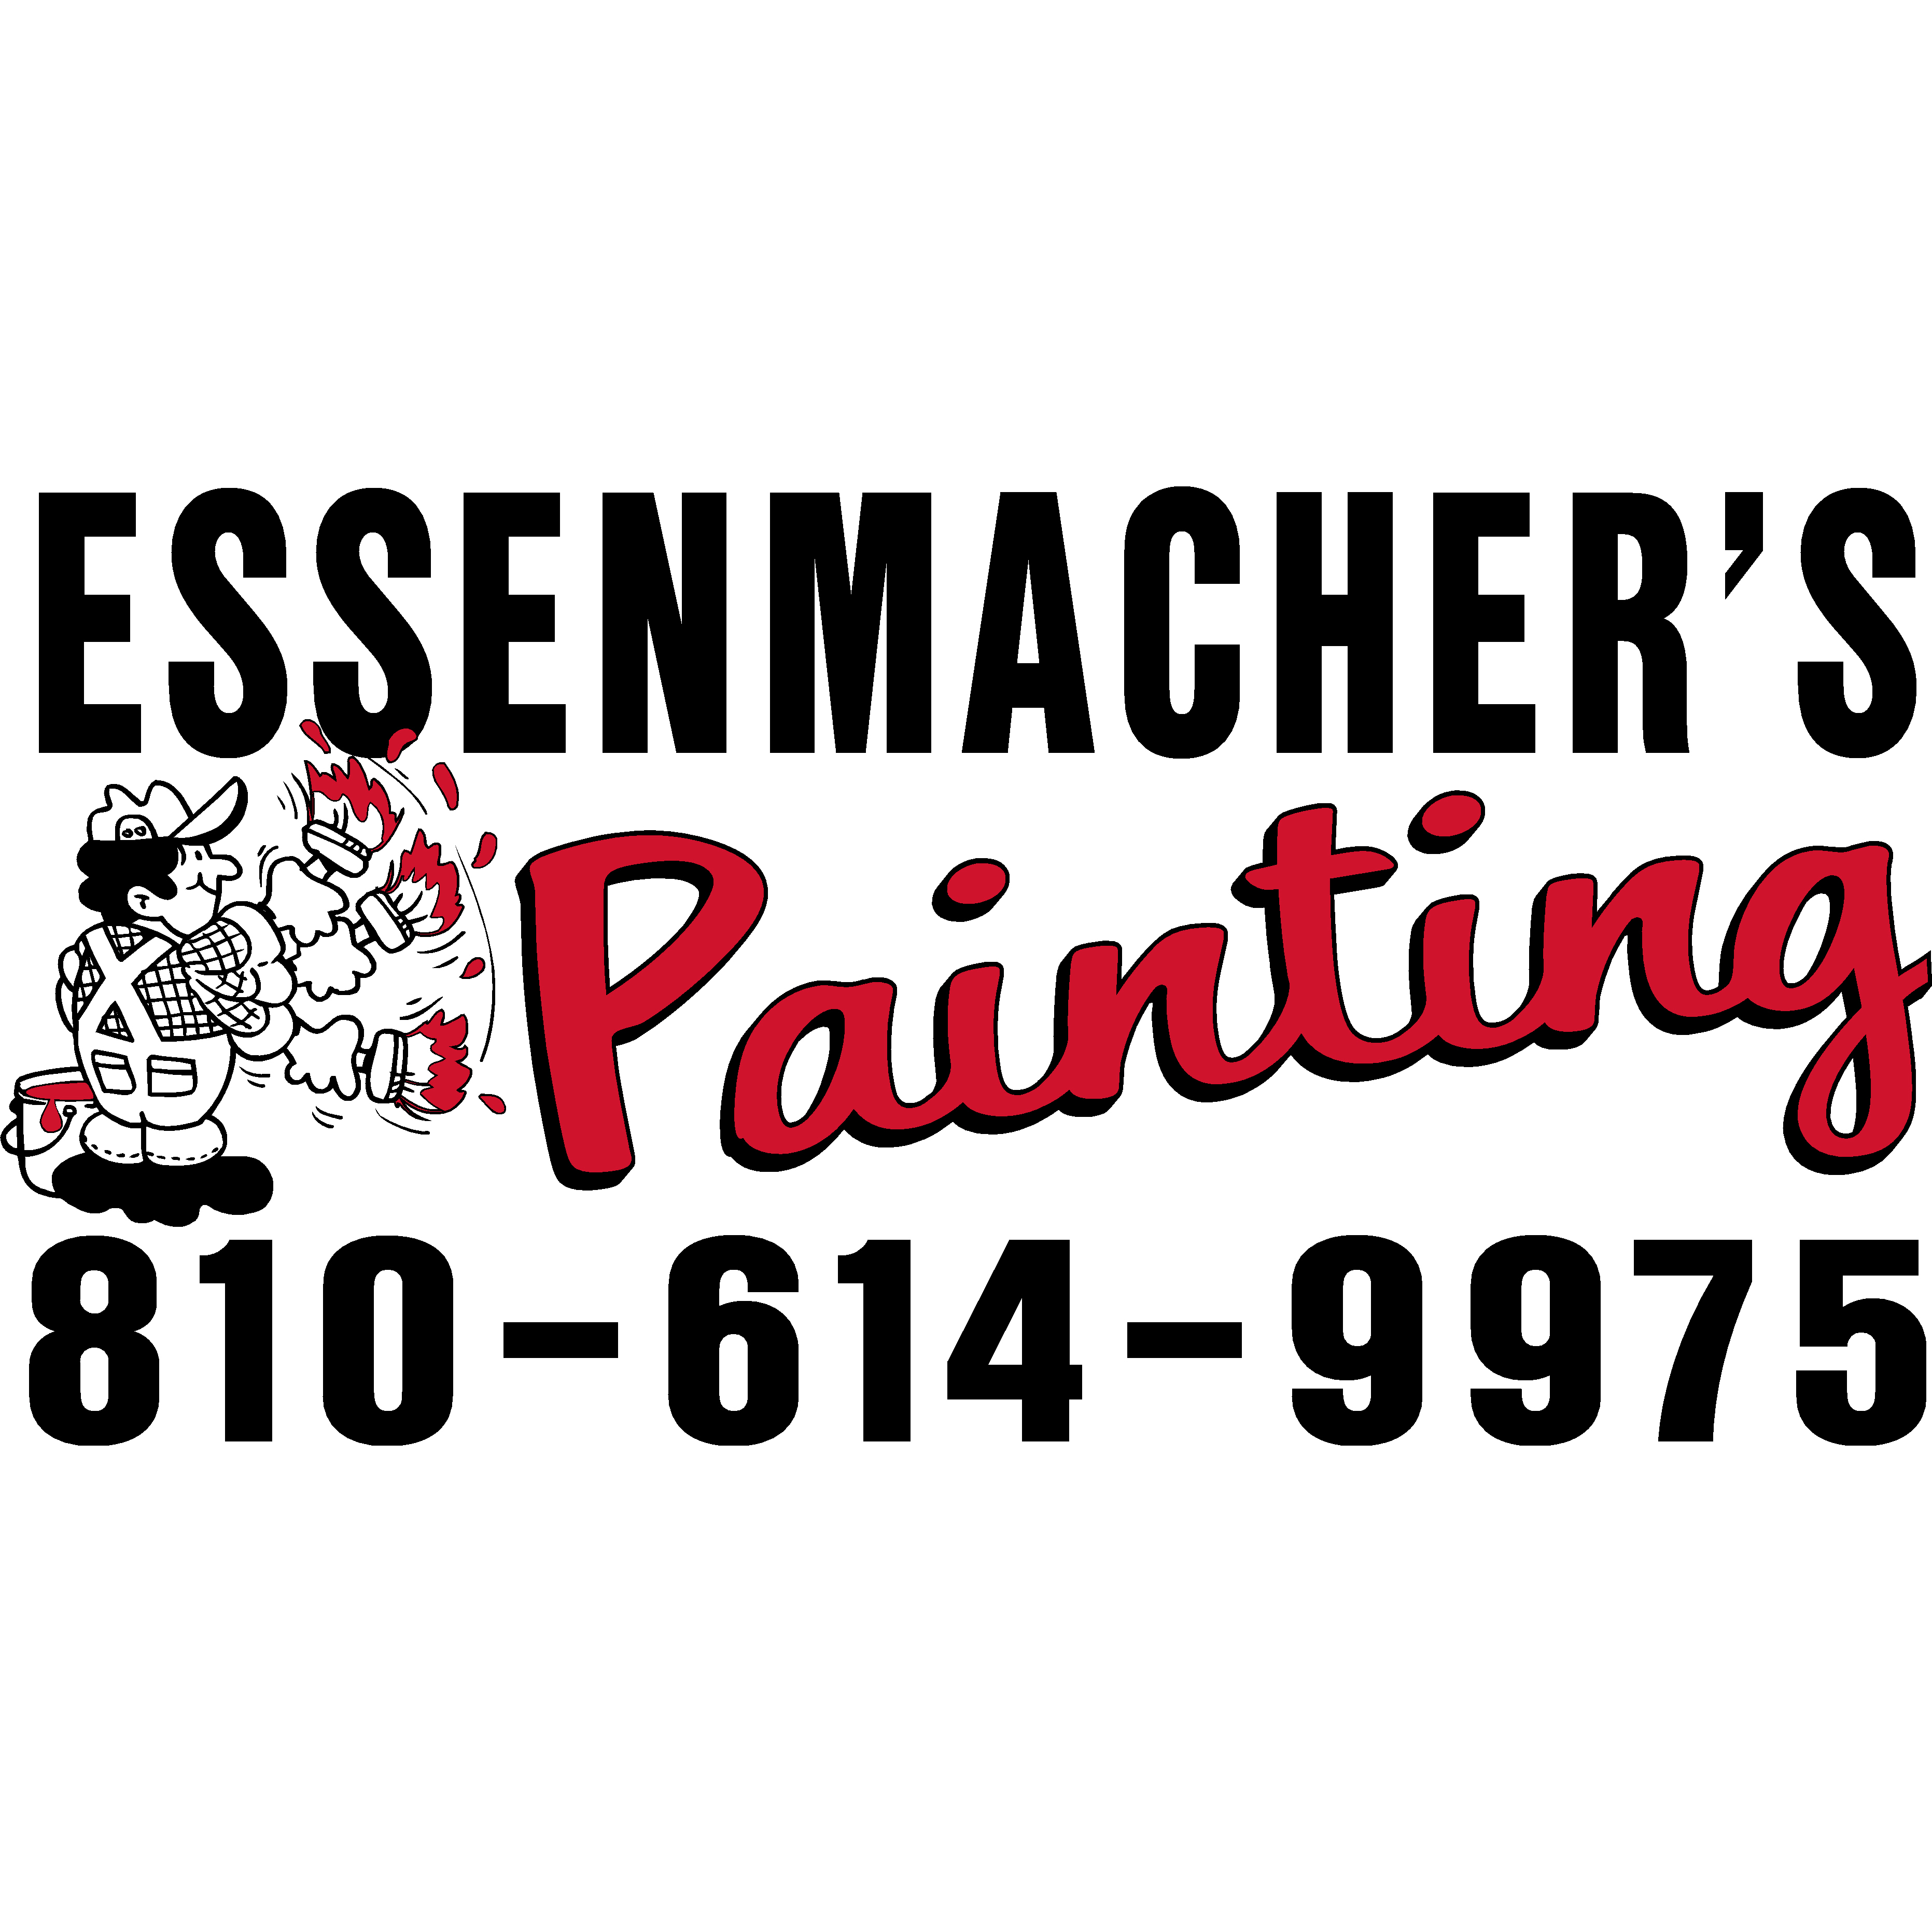 Essenmacher's Painting